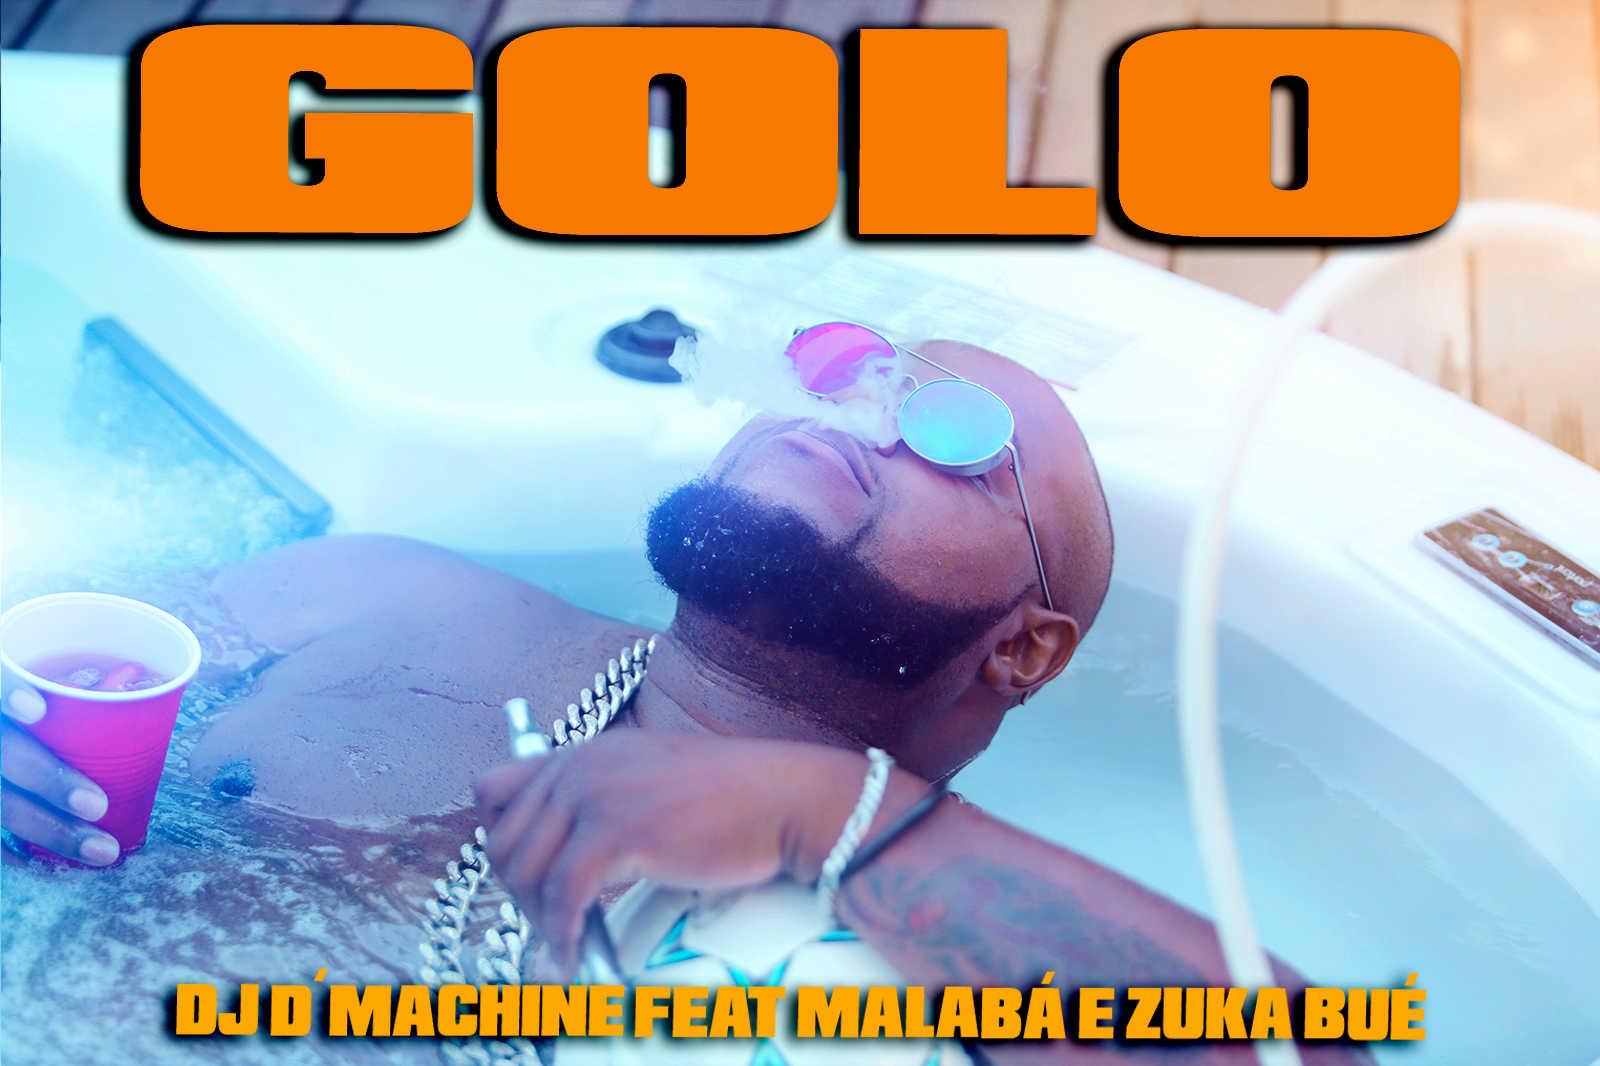 VIDEOCLIP - DJ D´MACHINE - GOLO FEAT MALABA E ZUKABUEMUSIC